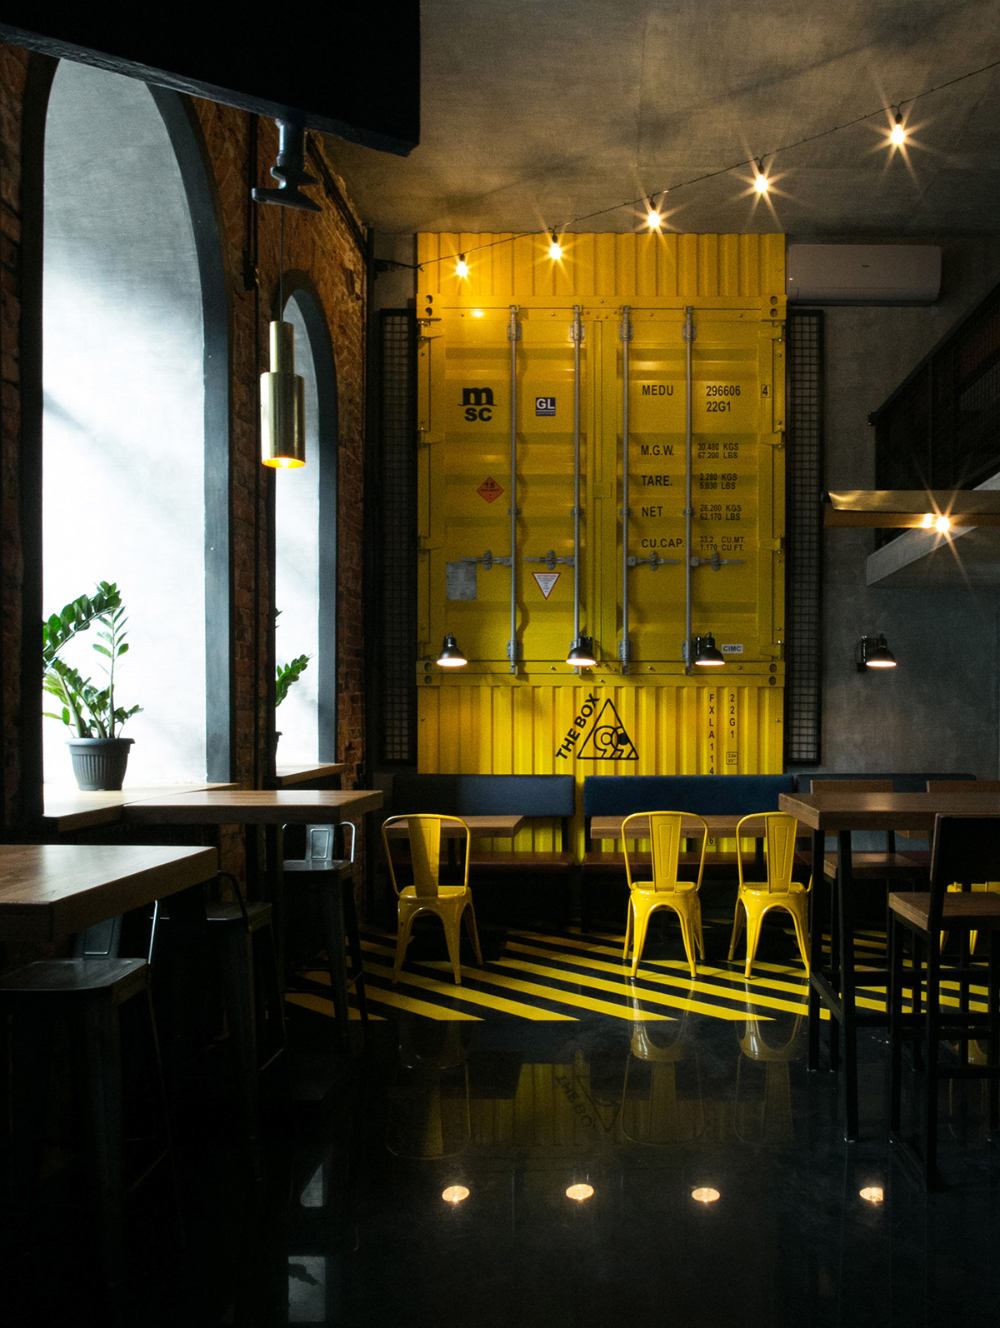 Behance 搜索 Bar restaurant interior, Bar design